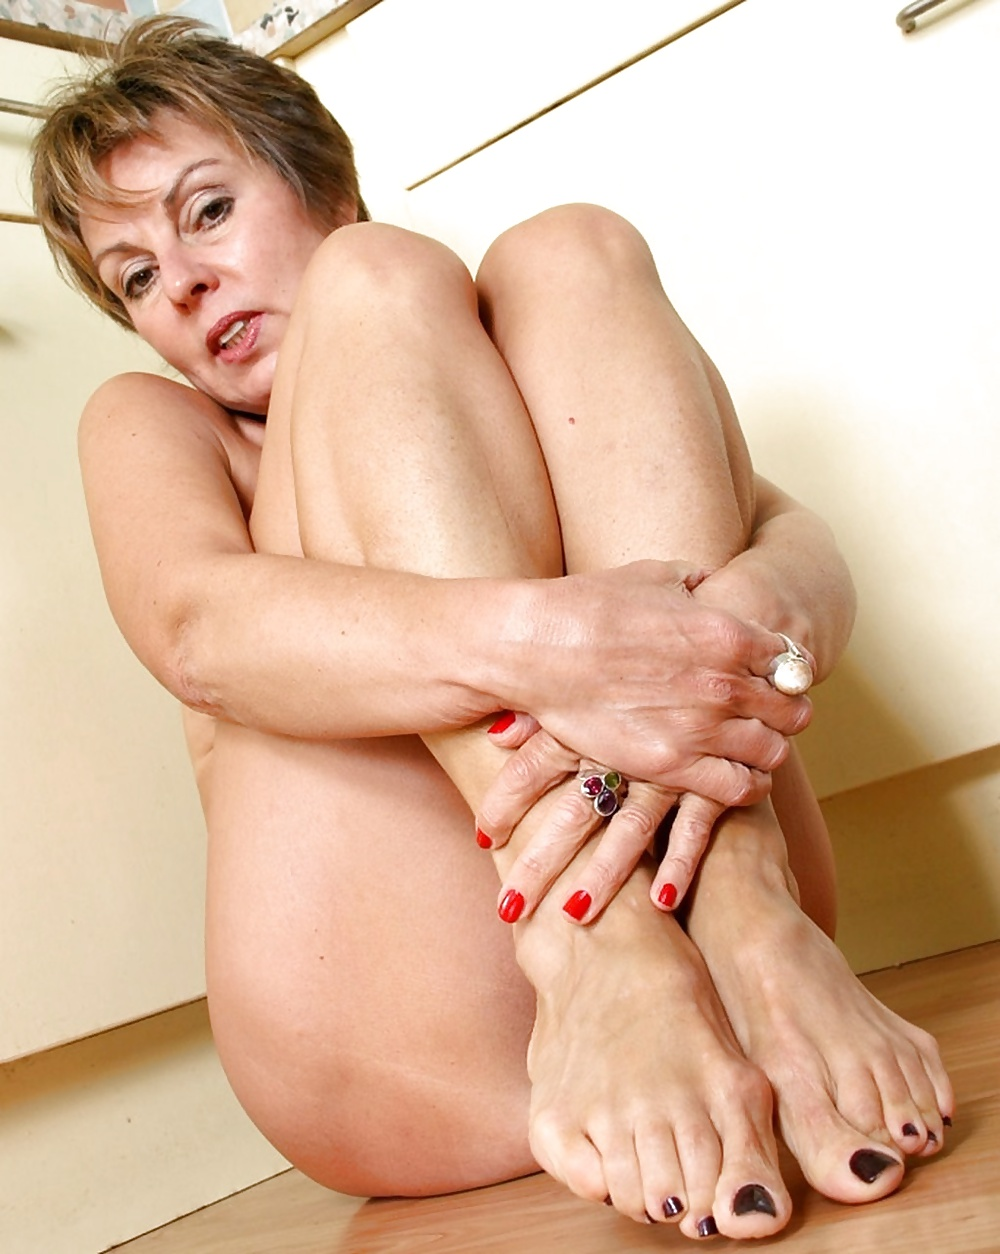 Видео ног зрелых женщин